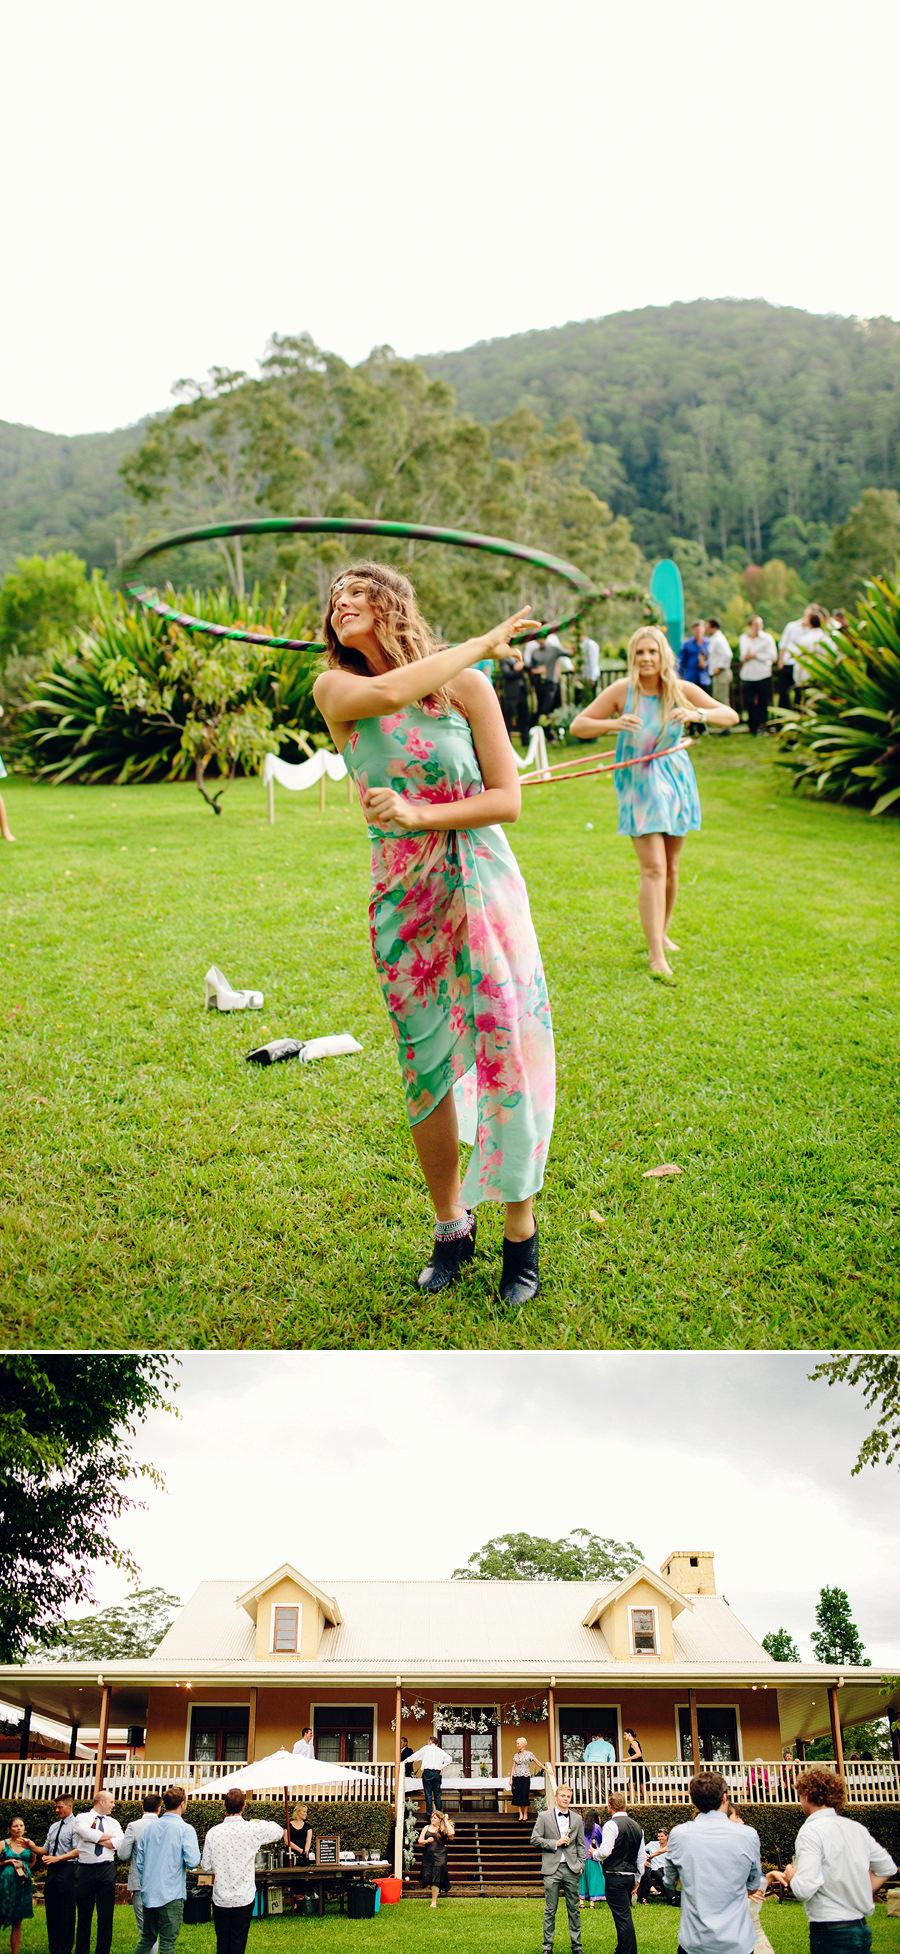 Fun Wedding Photography: Lawn Games